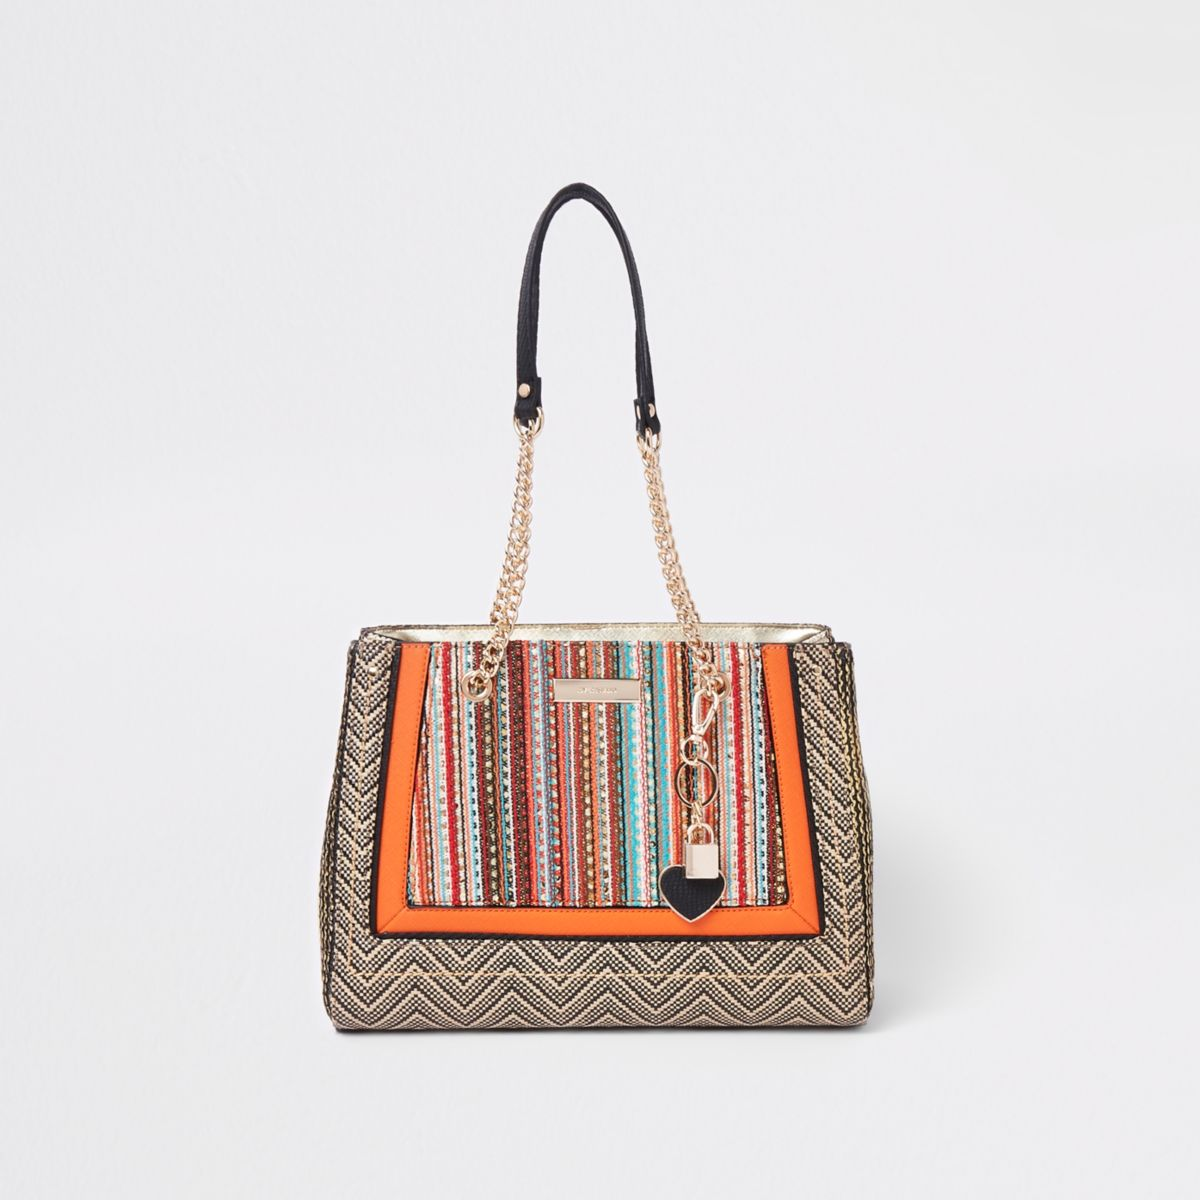 Orange woven panel charm tote bag